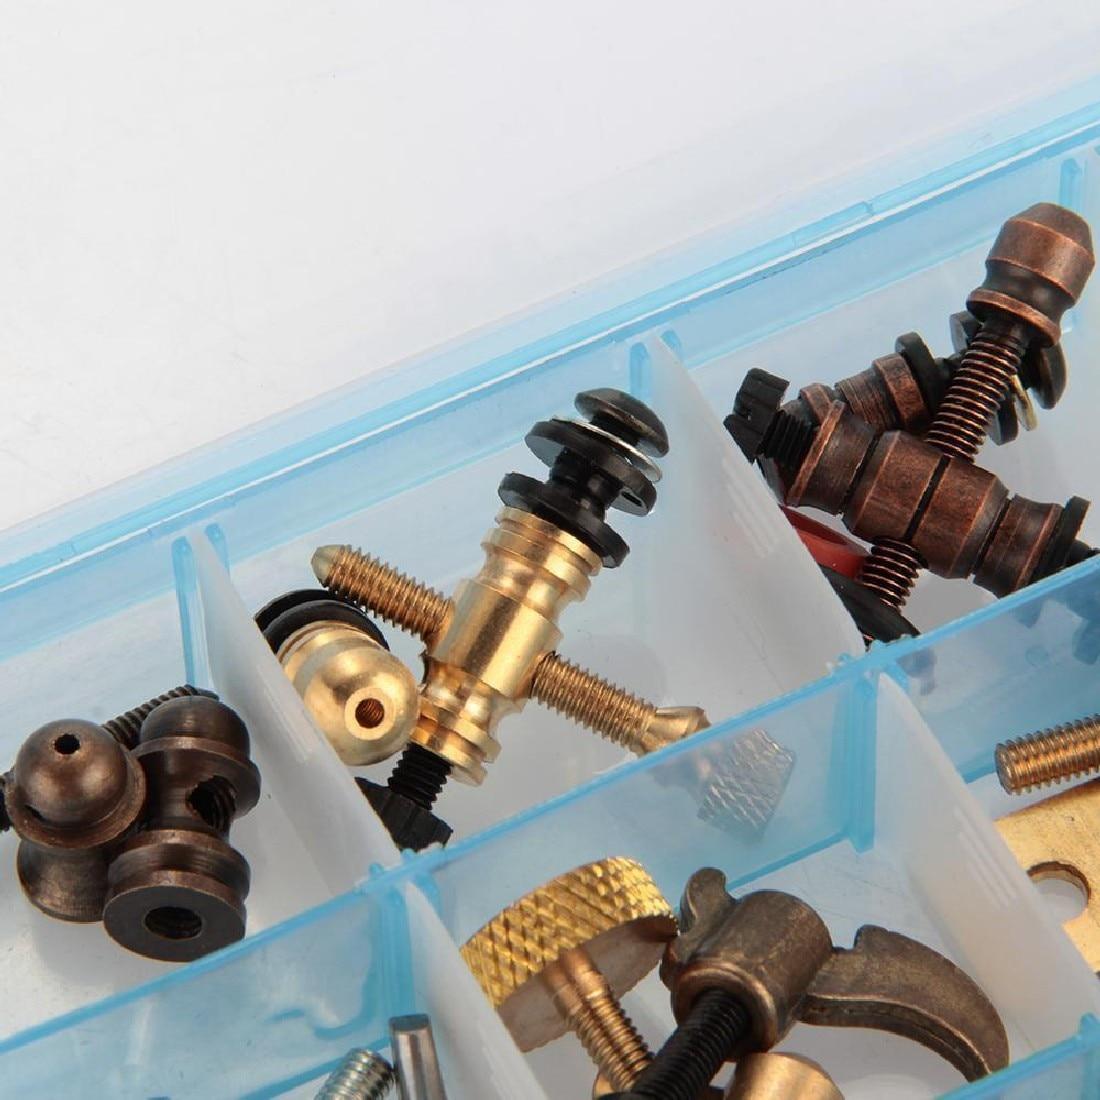 Tattoo Parts and Accessories Screws Kit for Machine Gun Performent Body Art DIY Supply set blue